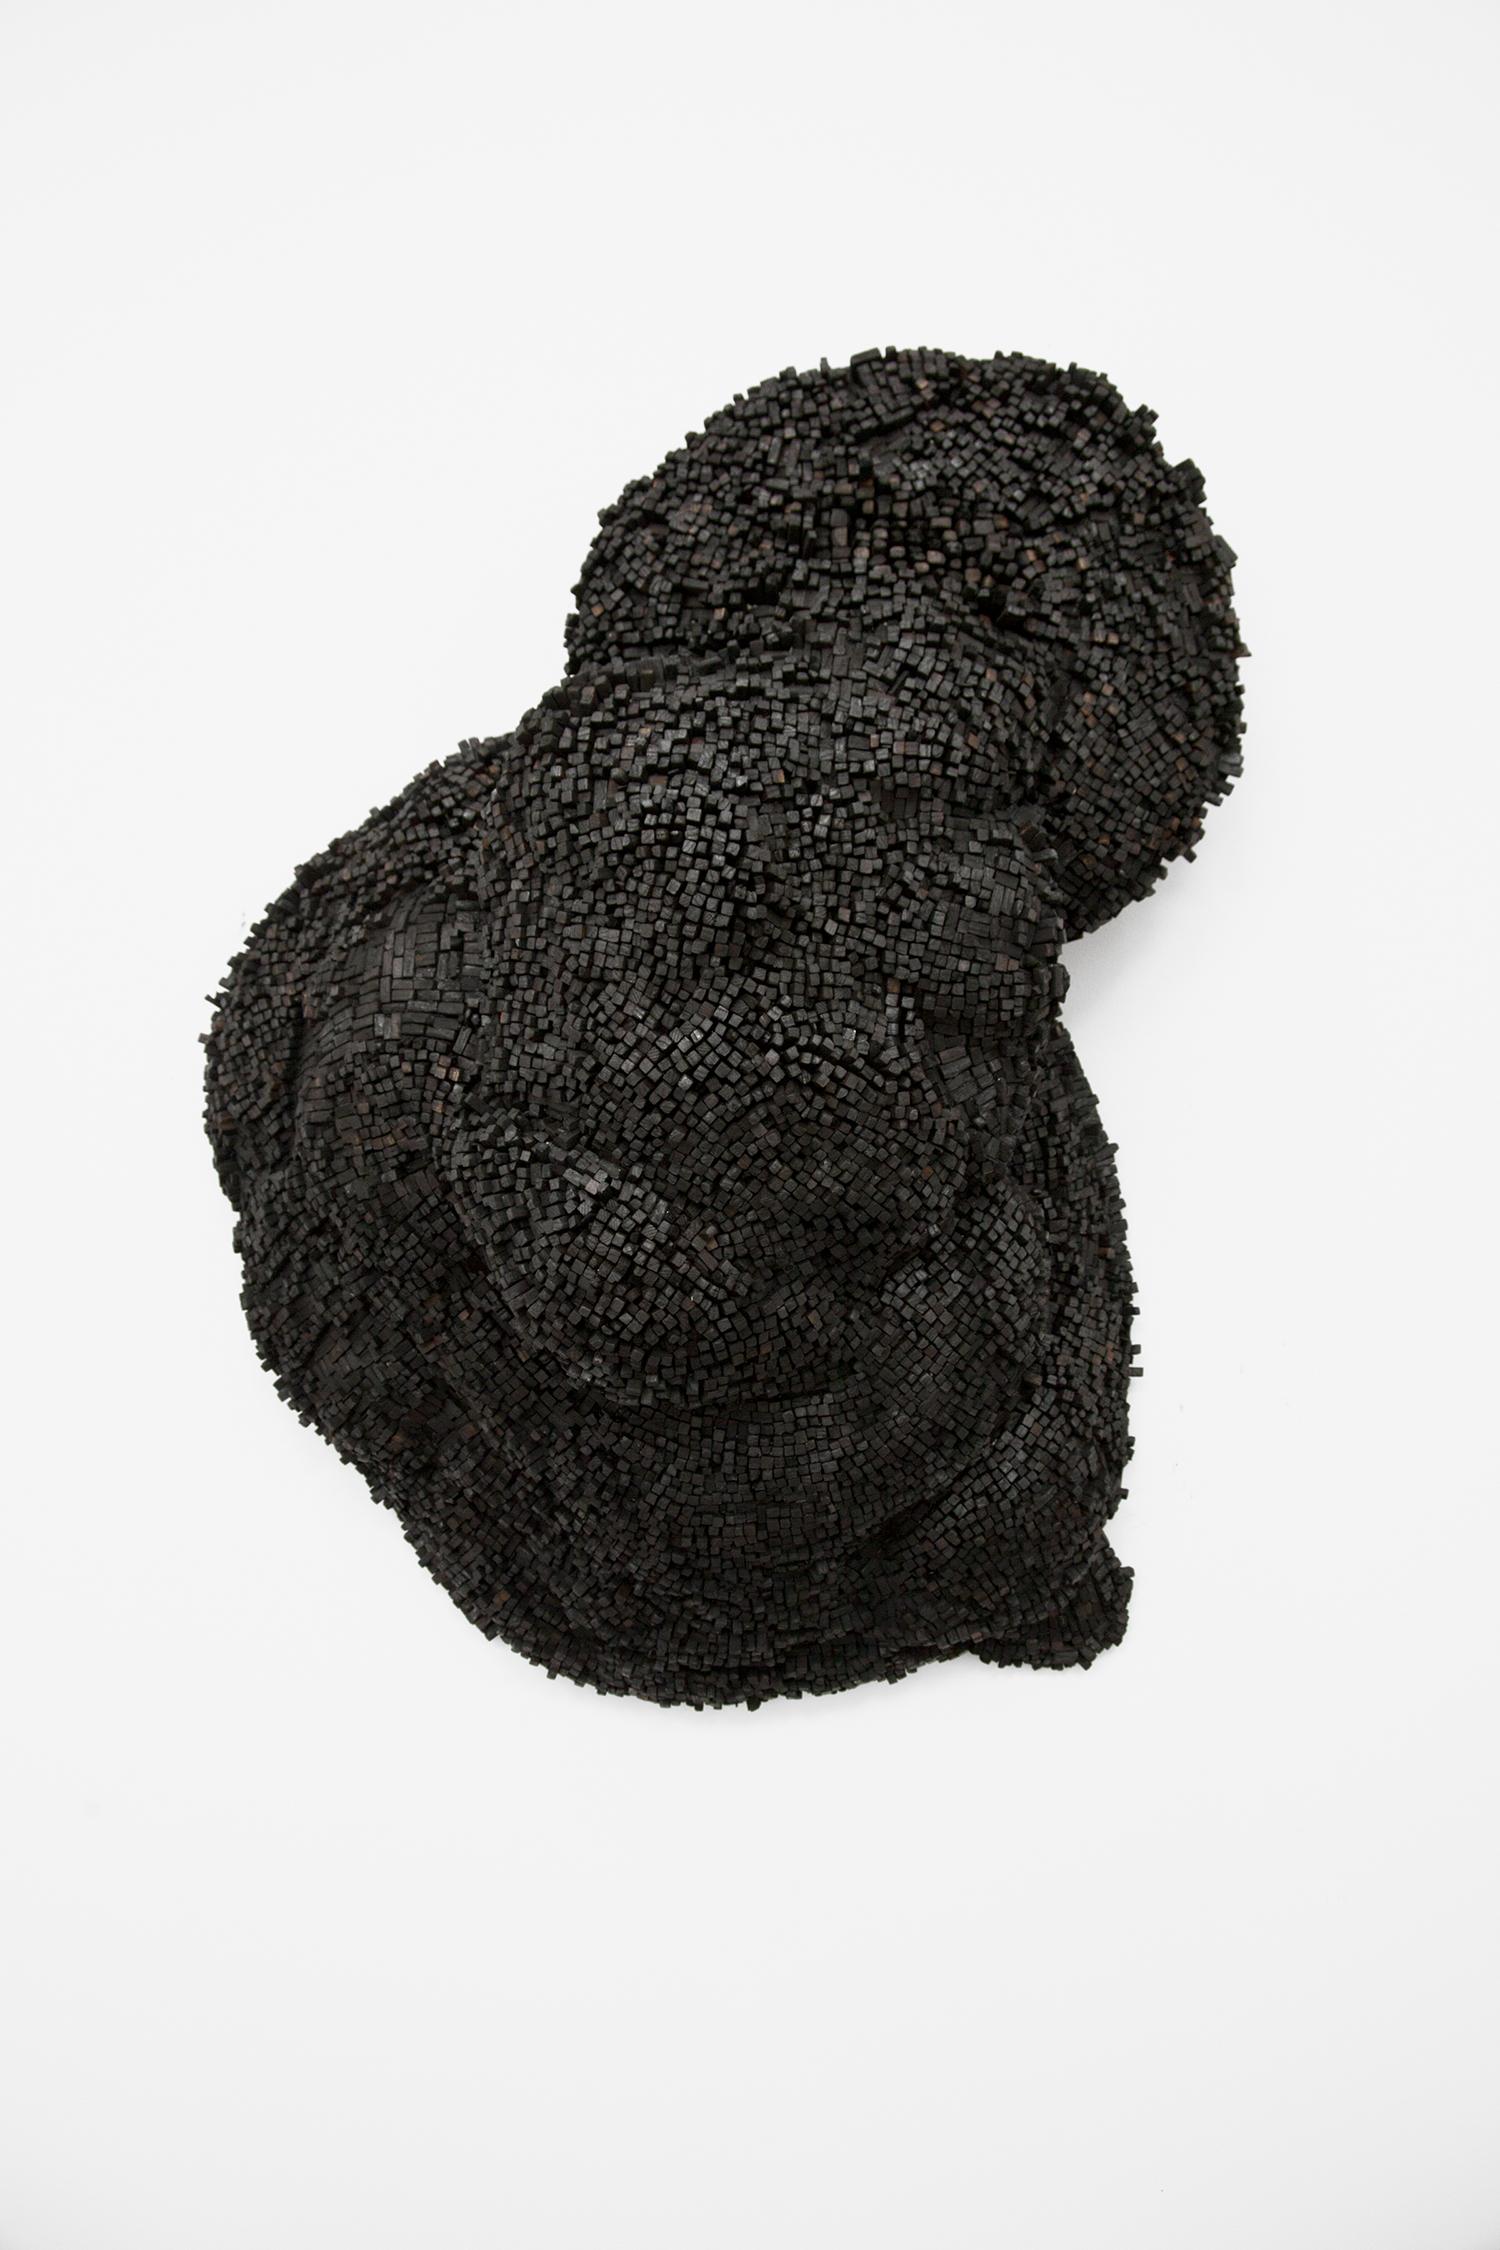 char  2018 charcoal, styrofoam, papier maché  36 x 30 x 11 inches